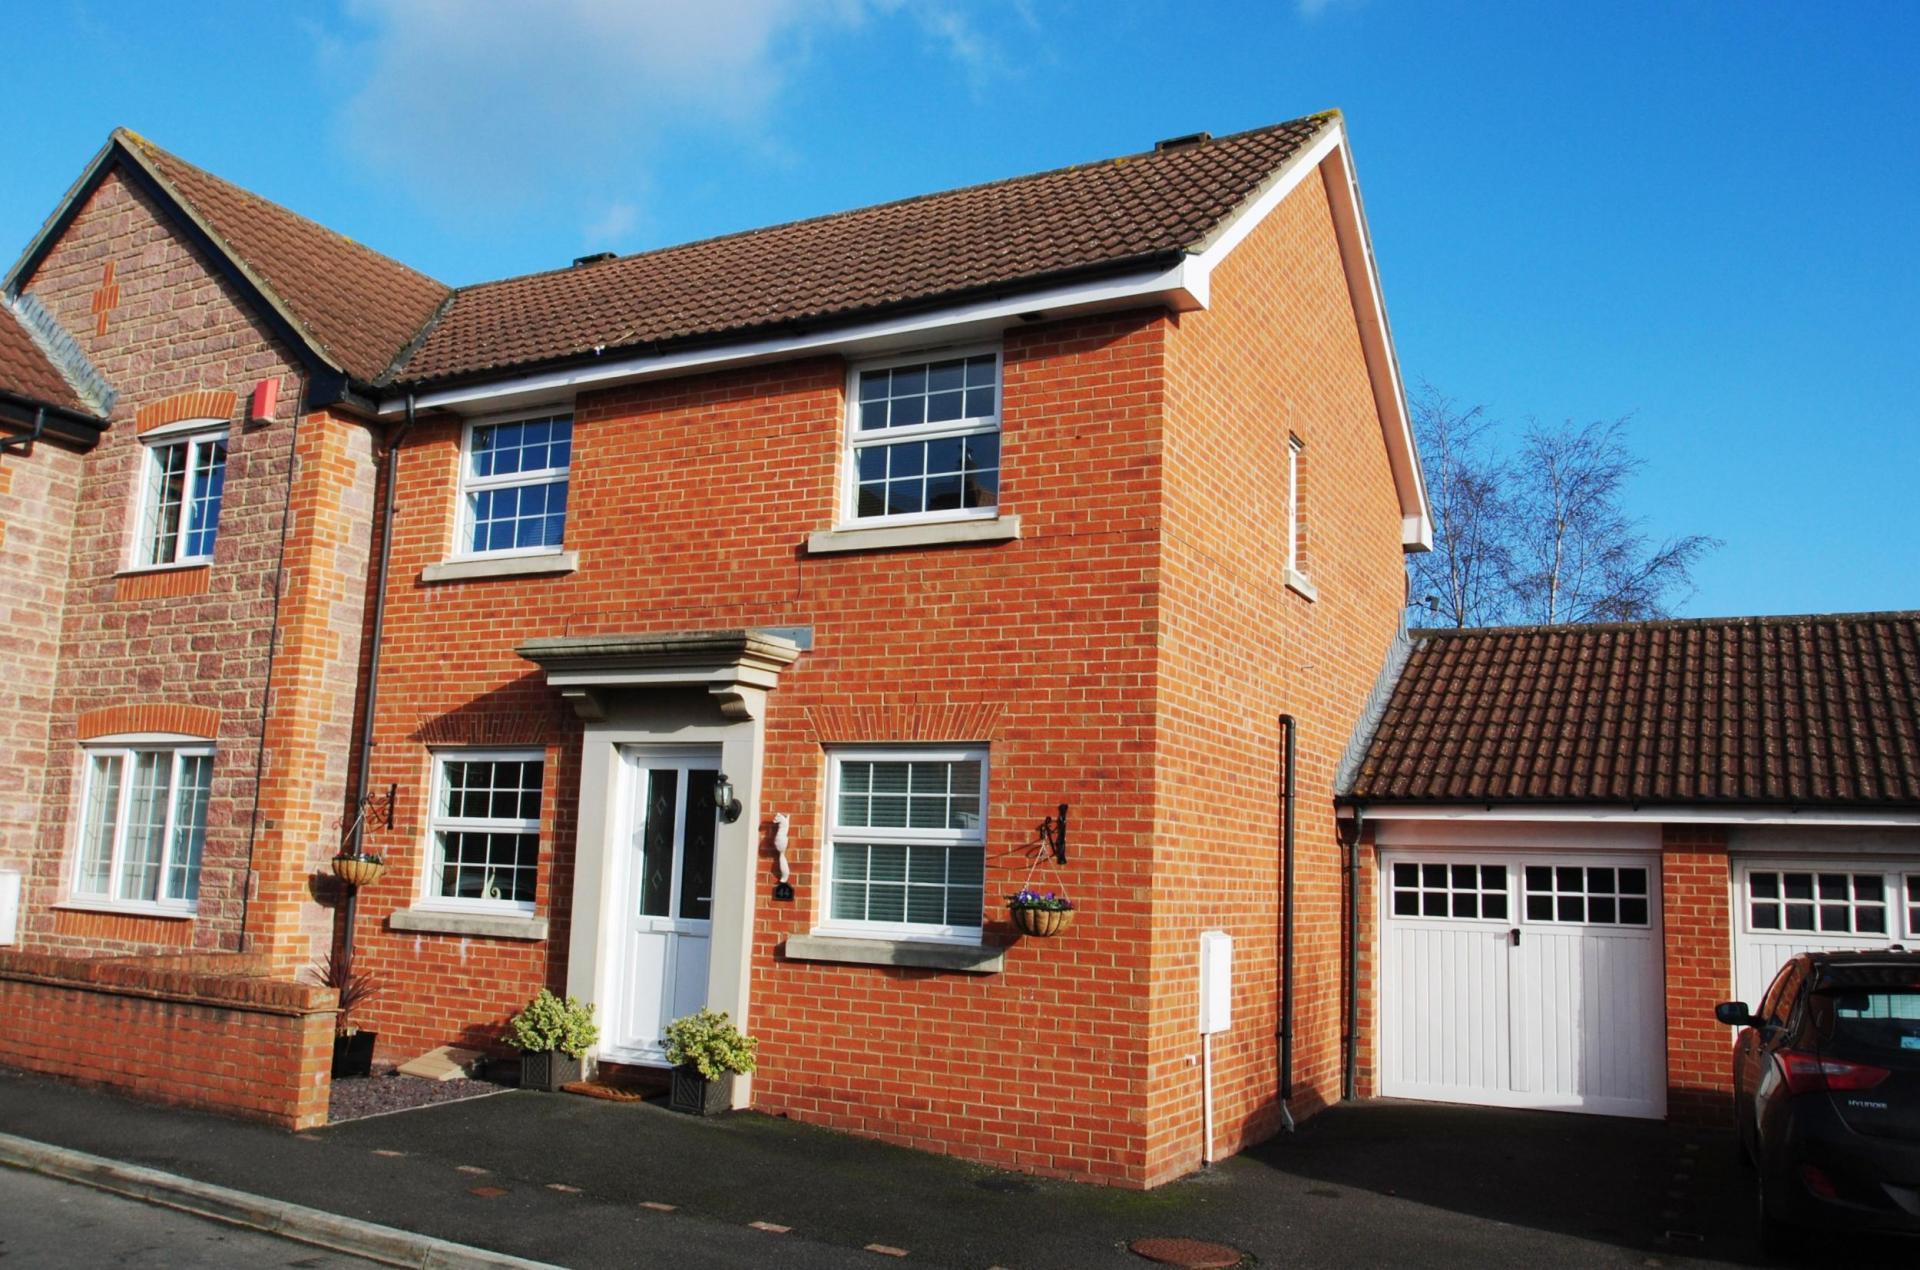 Property For Sale In Waterleaze Taunton